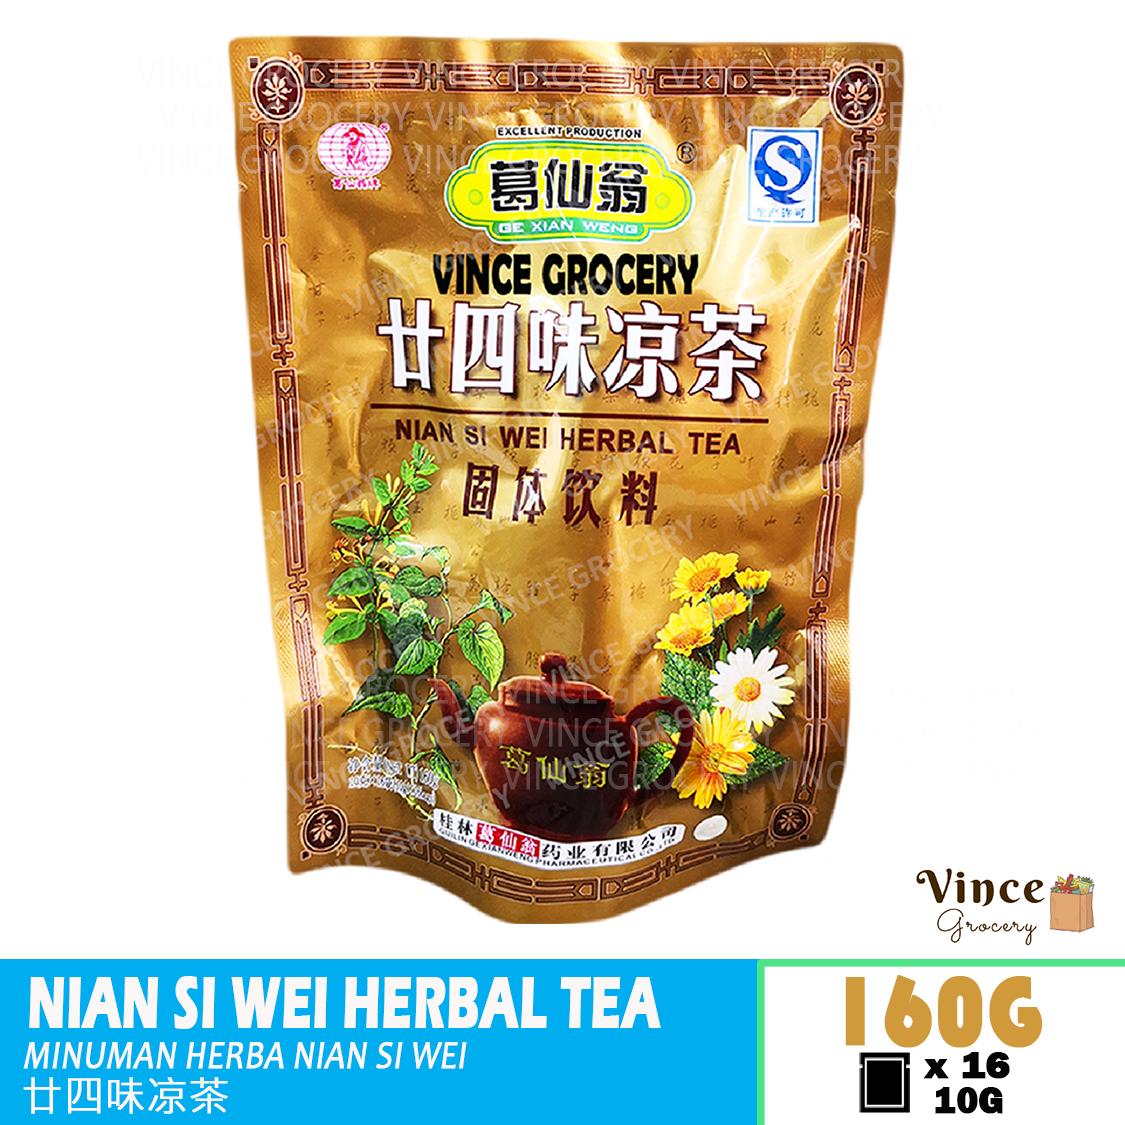 GE XIAN WENG Nian Si Wei (24 Herbs) Herbal Tea  葛仙翁廿四味凉茶 160G (16's x 10G)